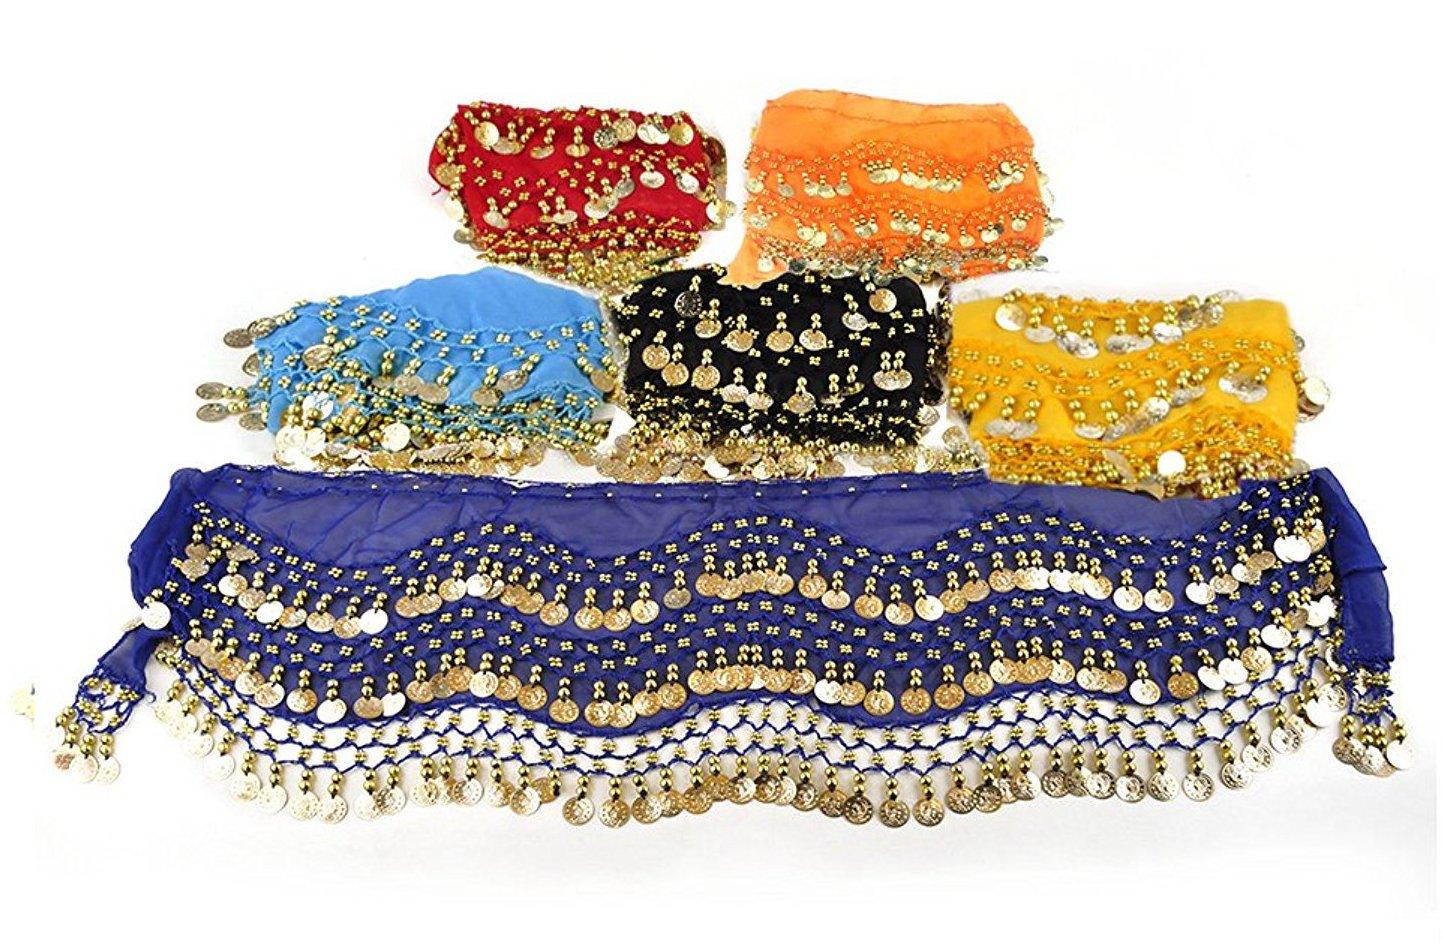 REINDEAR Wholesale Vogue Style Chiffon Dangling Gold Coins Belly Dance Hip Scarf (6 PCs)